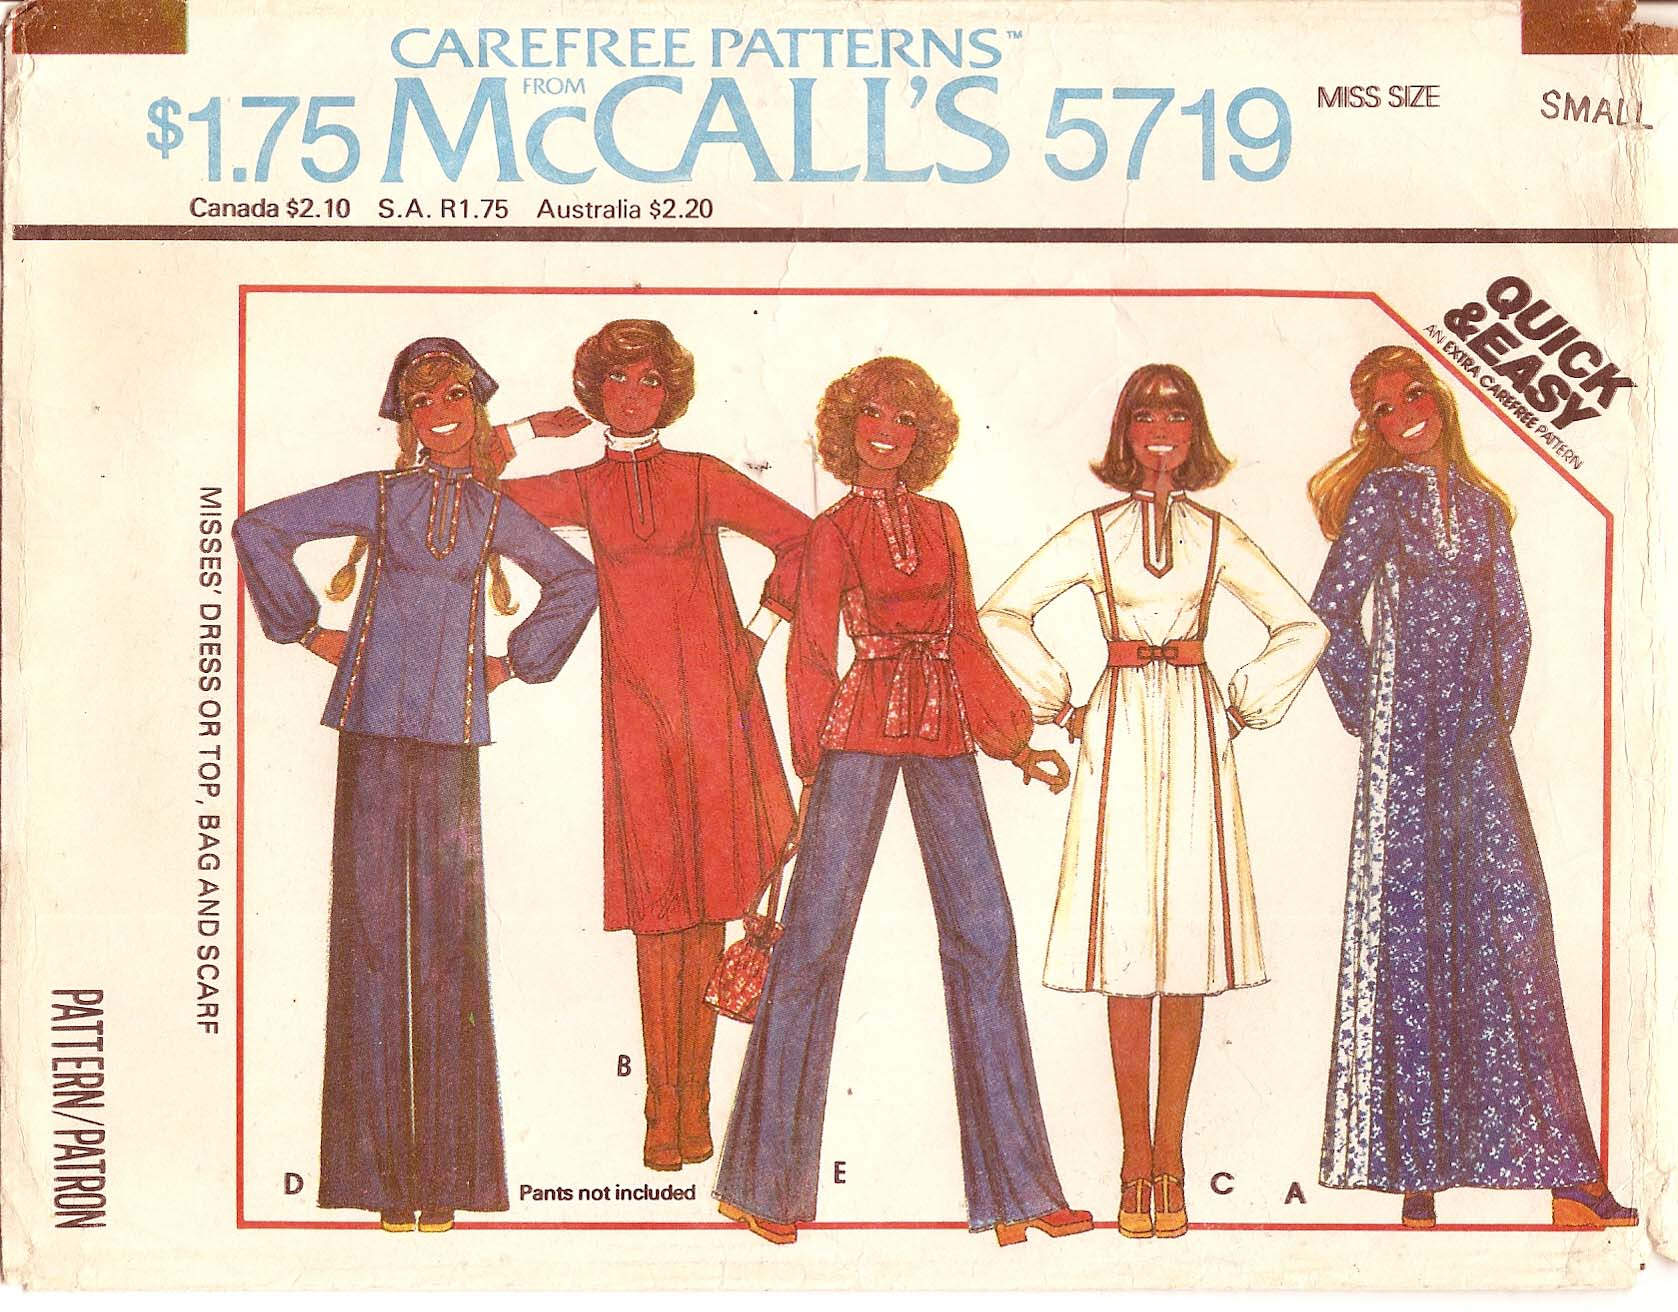 McCall's 5719